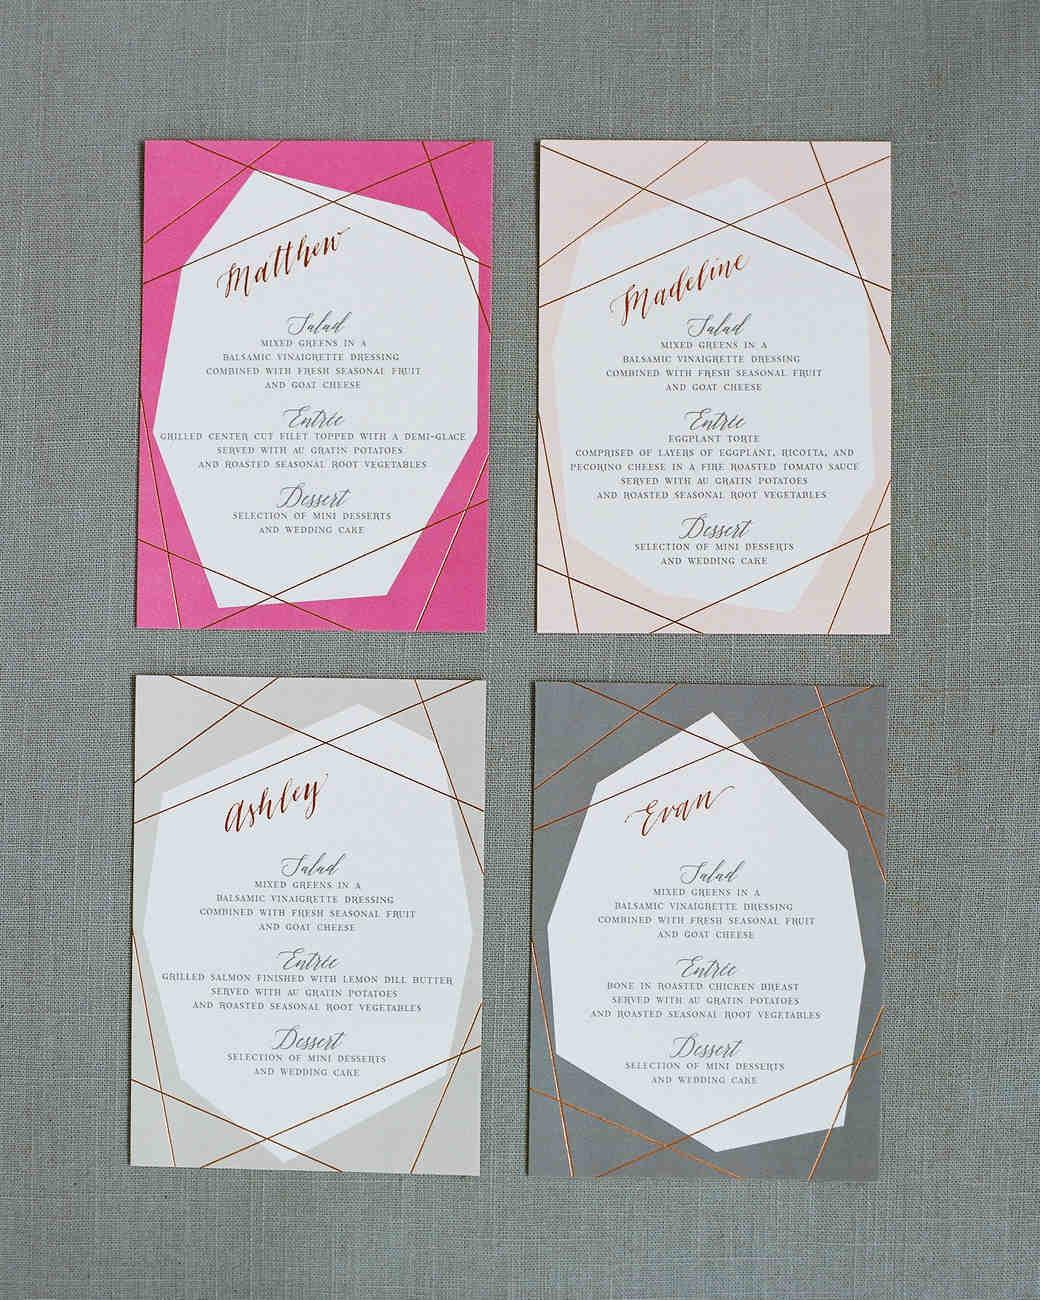 maddy-mike-wedding-menu-575.9778.05c.2015.49-6134174-0716.jpg